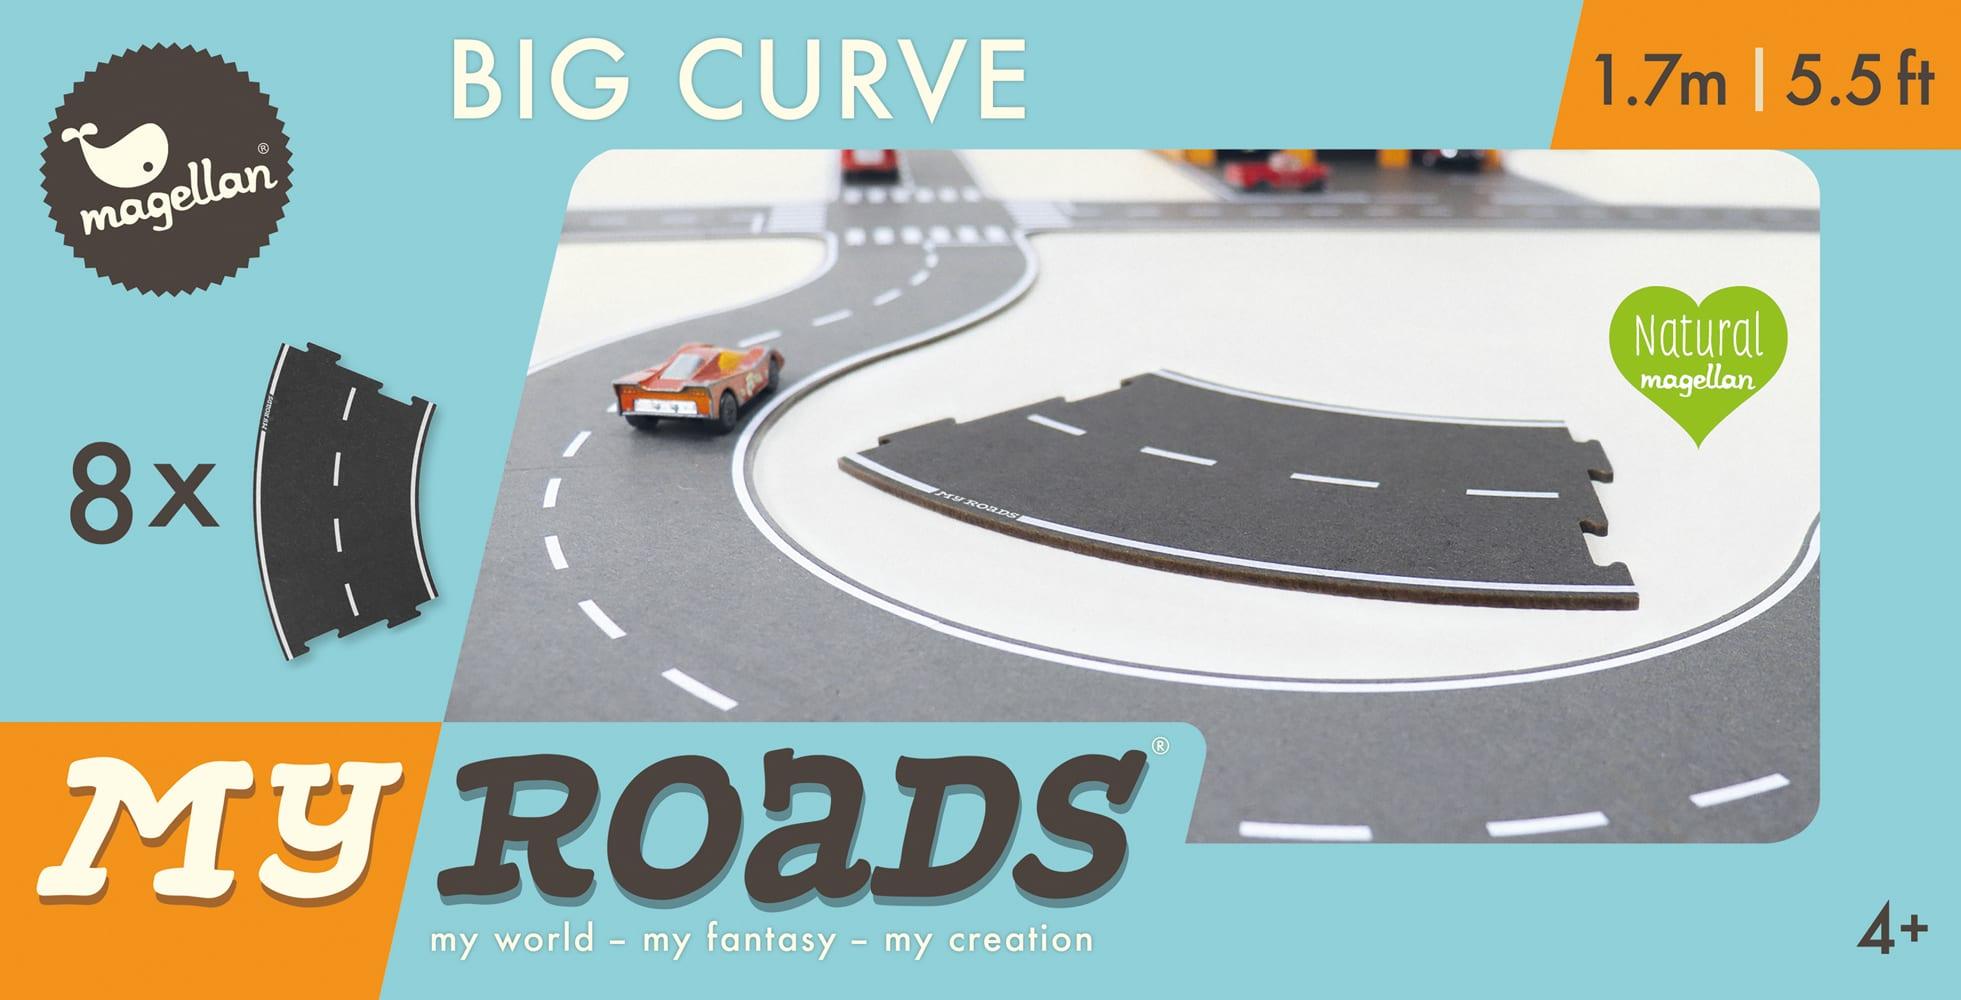 MyRoads - Big Curve